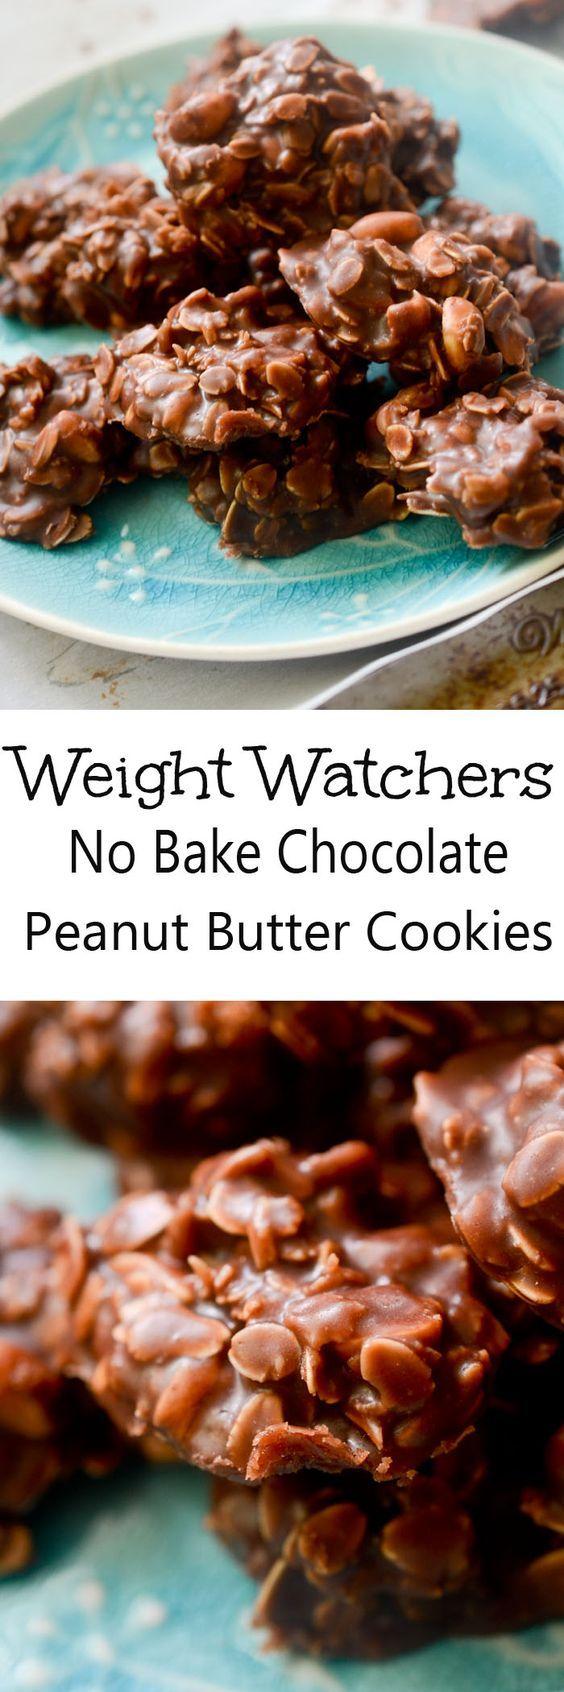 No Bake Chocolate Peanut Butter Cookies - Weight Watcher friendly - Recipe…